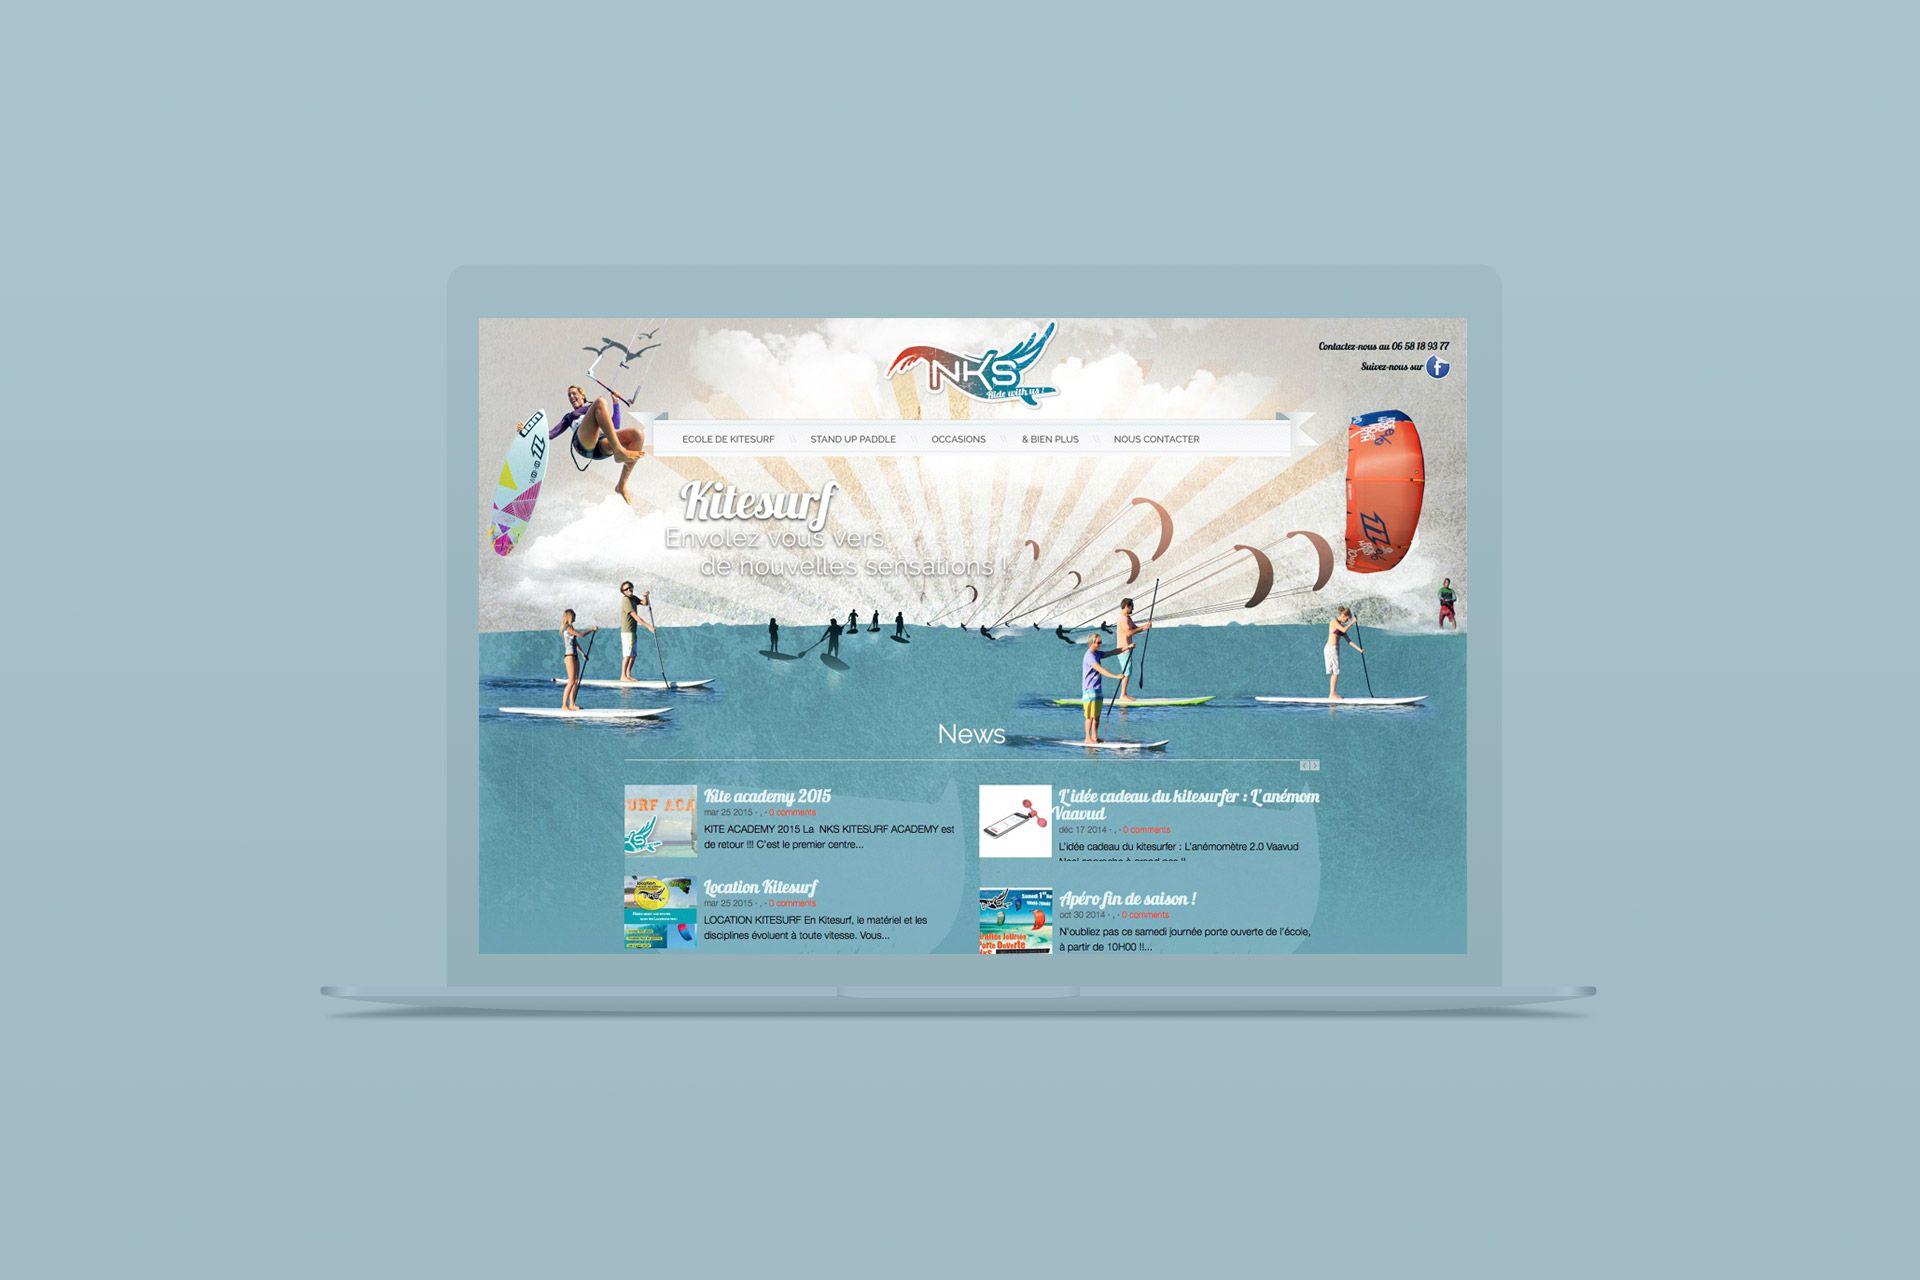 Kite surf • Site internet • Webdesign • Wordpress • NKS